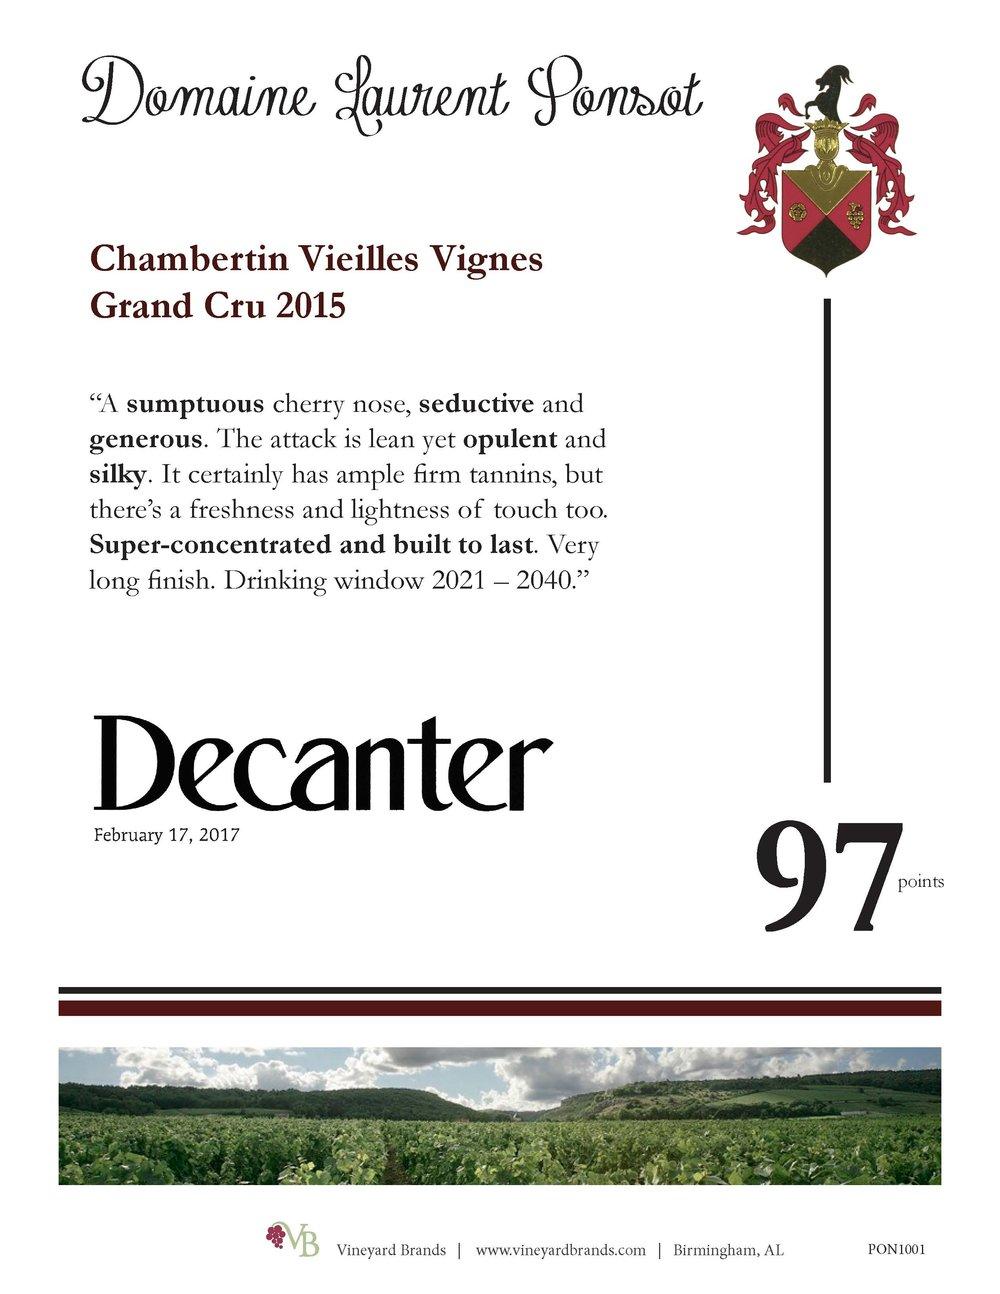 Ponsot Chambertin Vieilles Vignes Grand Cru 2015.jpg